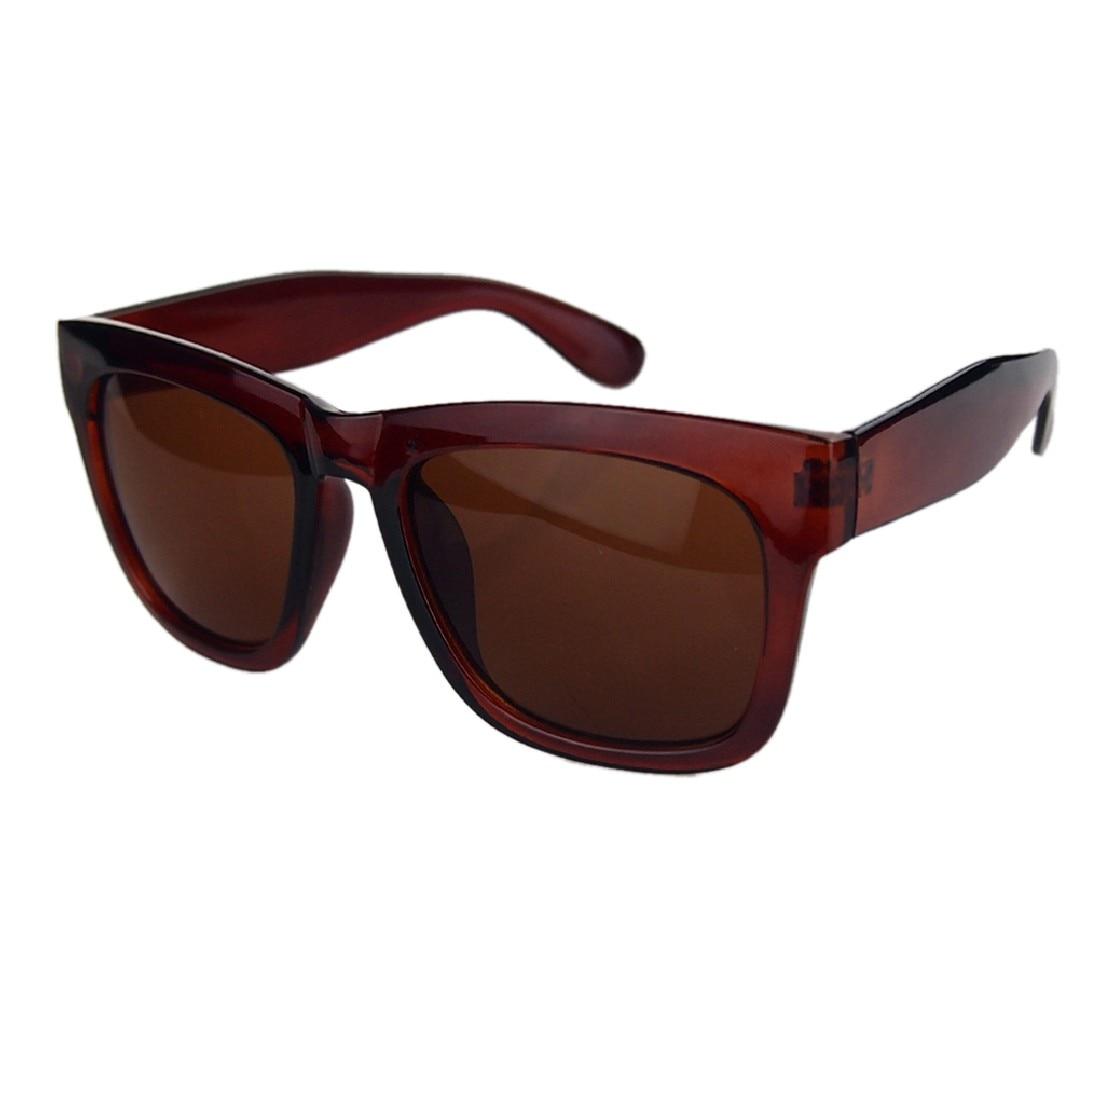 4b1f685866a9 Thick Eyeglass Frames Classic